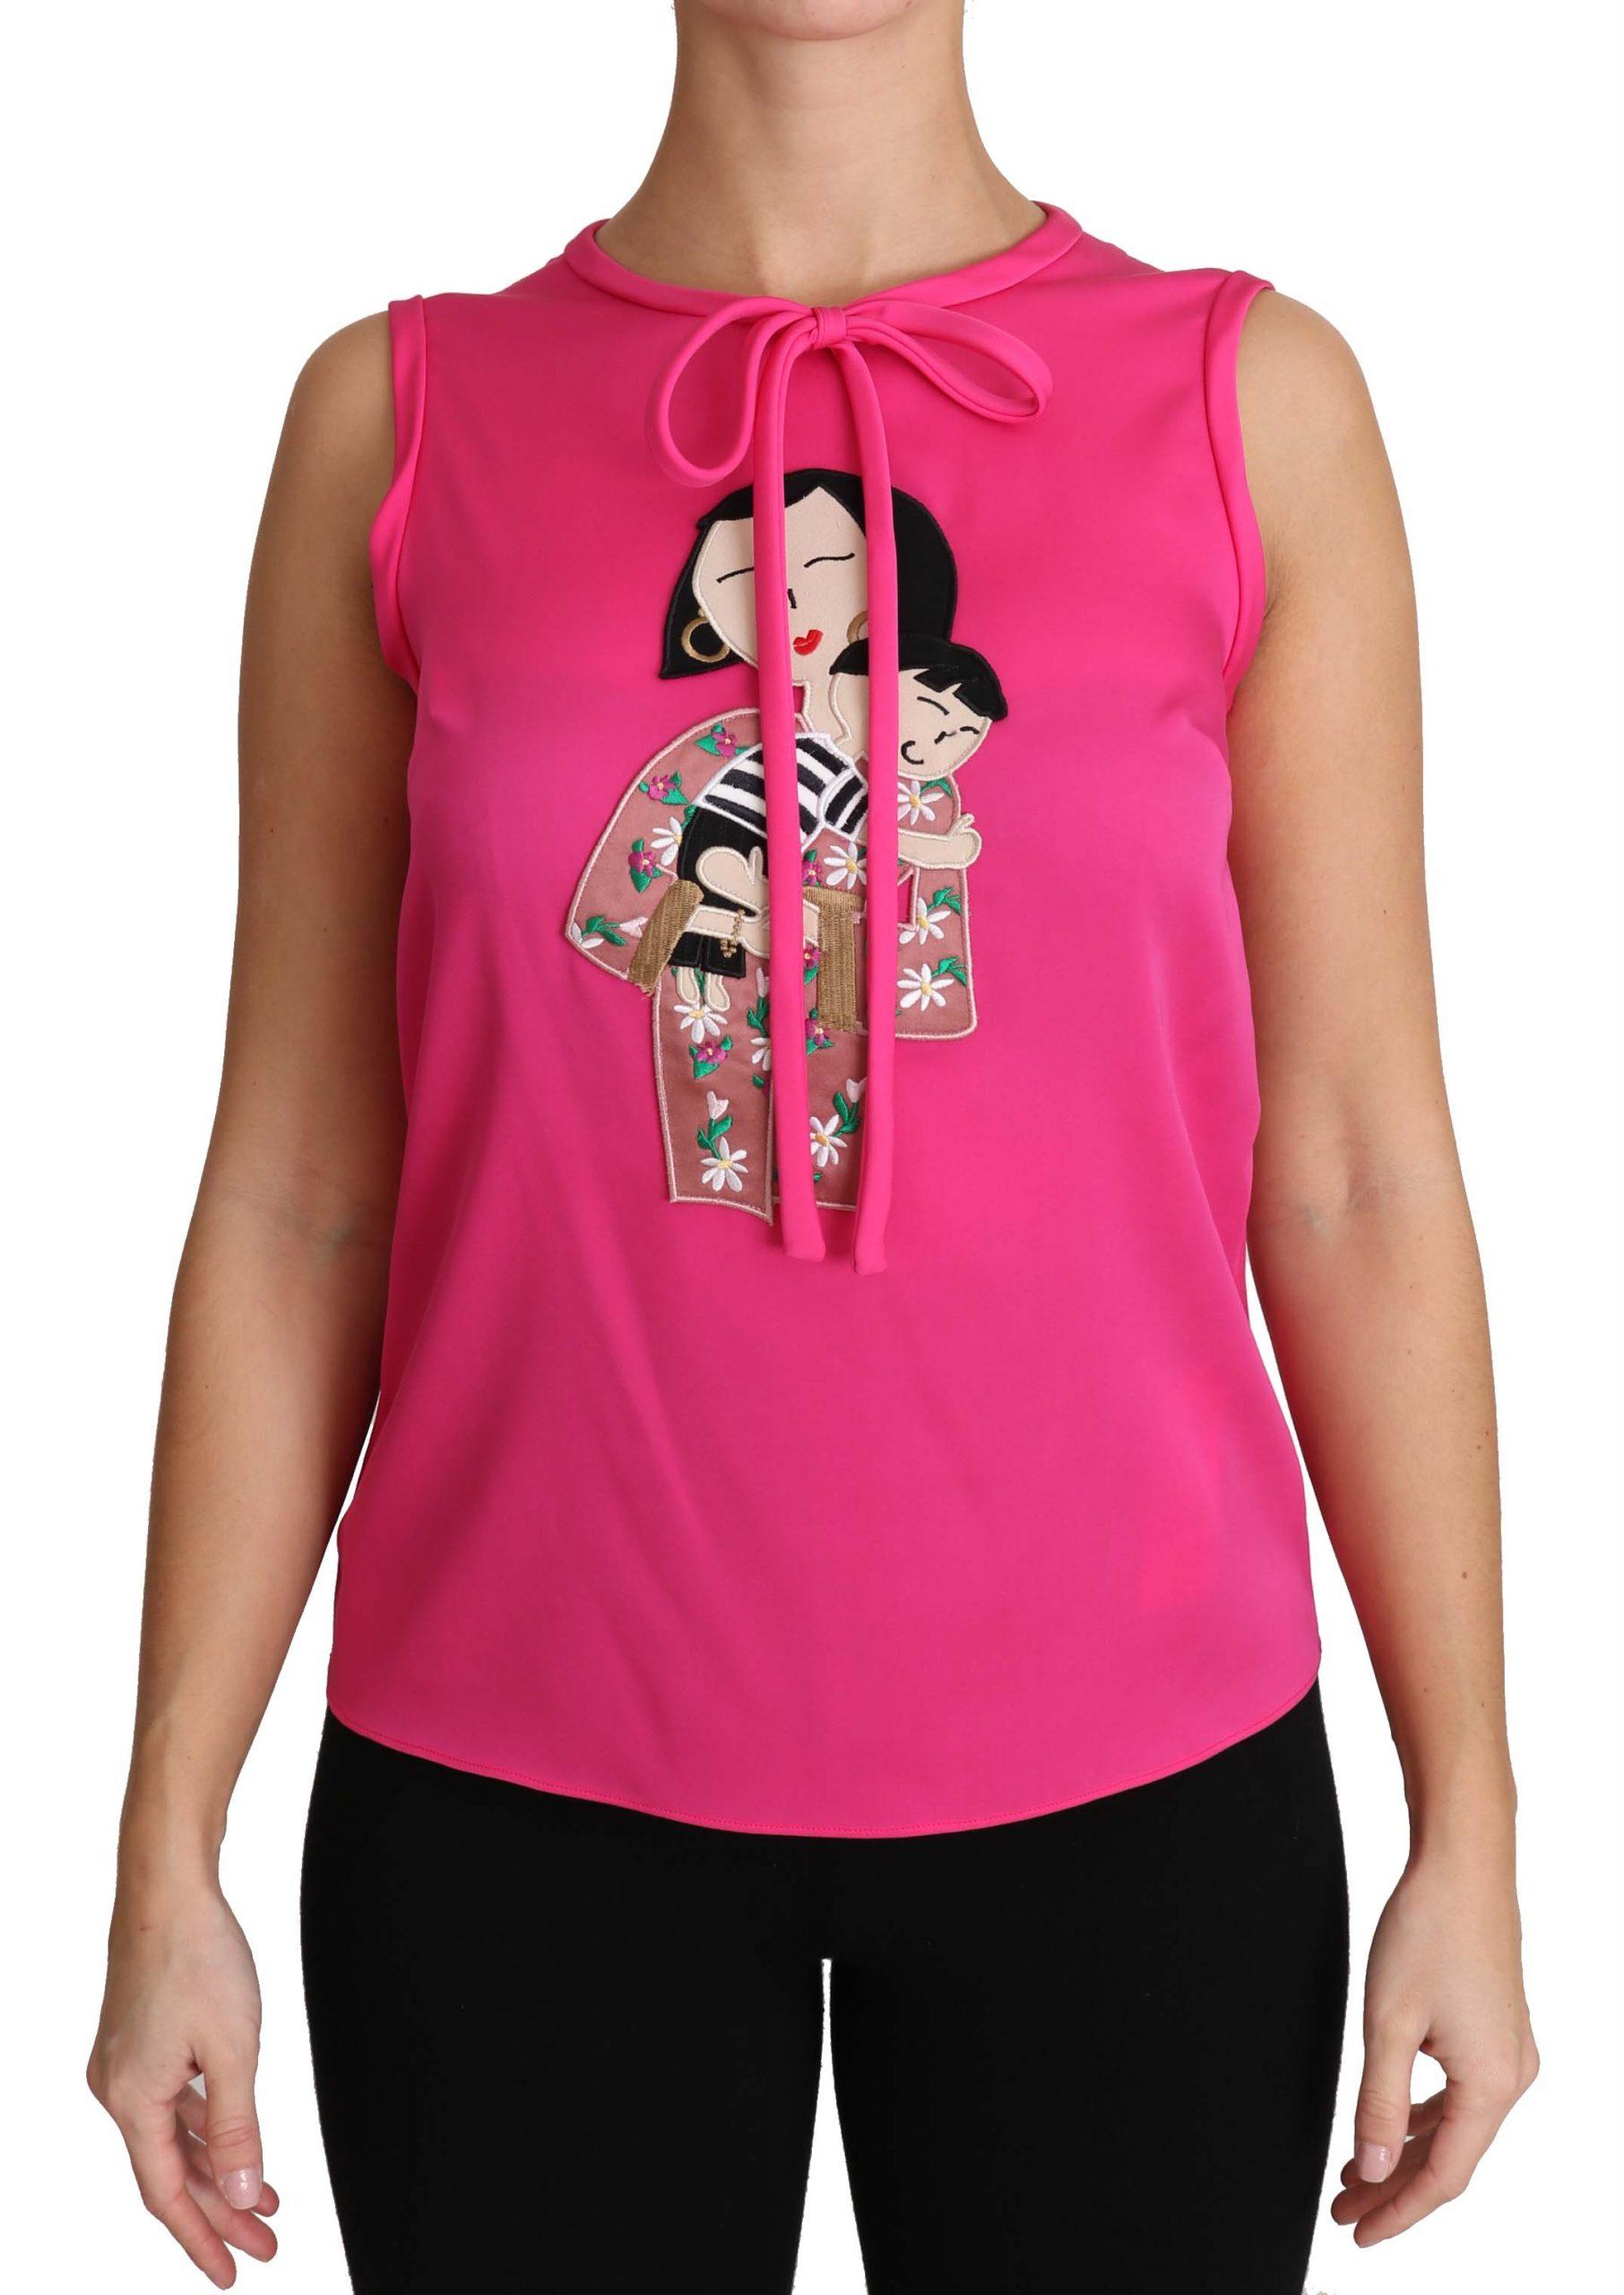 Dolce & Gabbana Women's Family Tops Pink TSH3161 - IT36|XXS